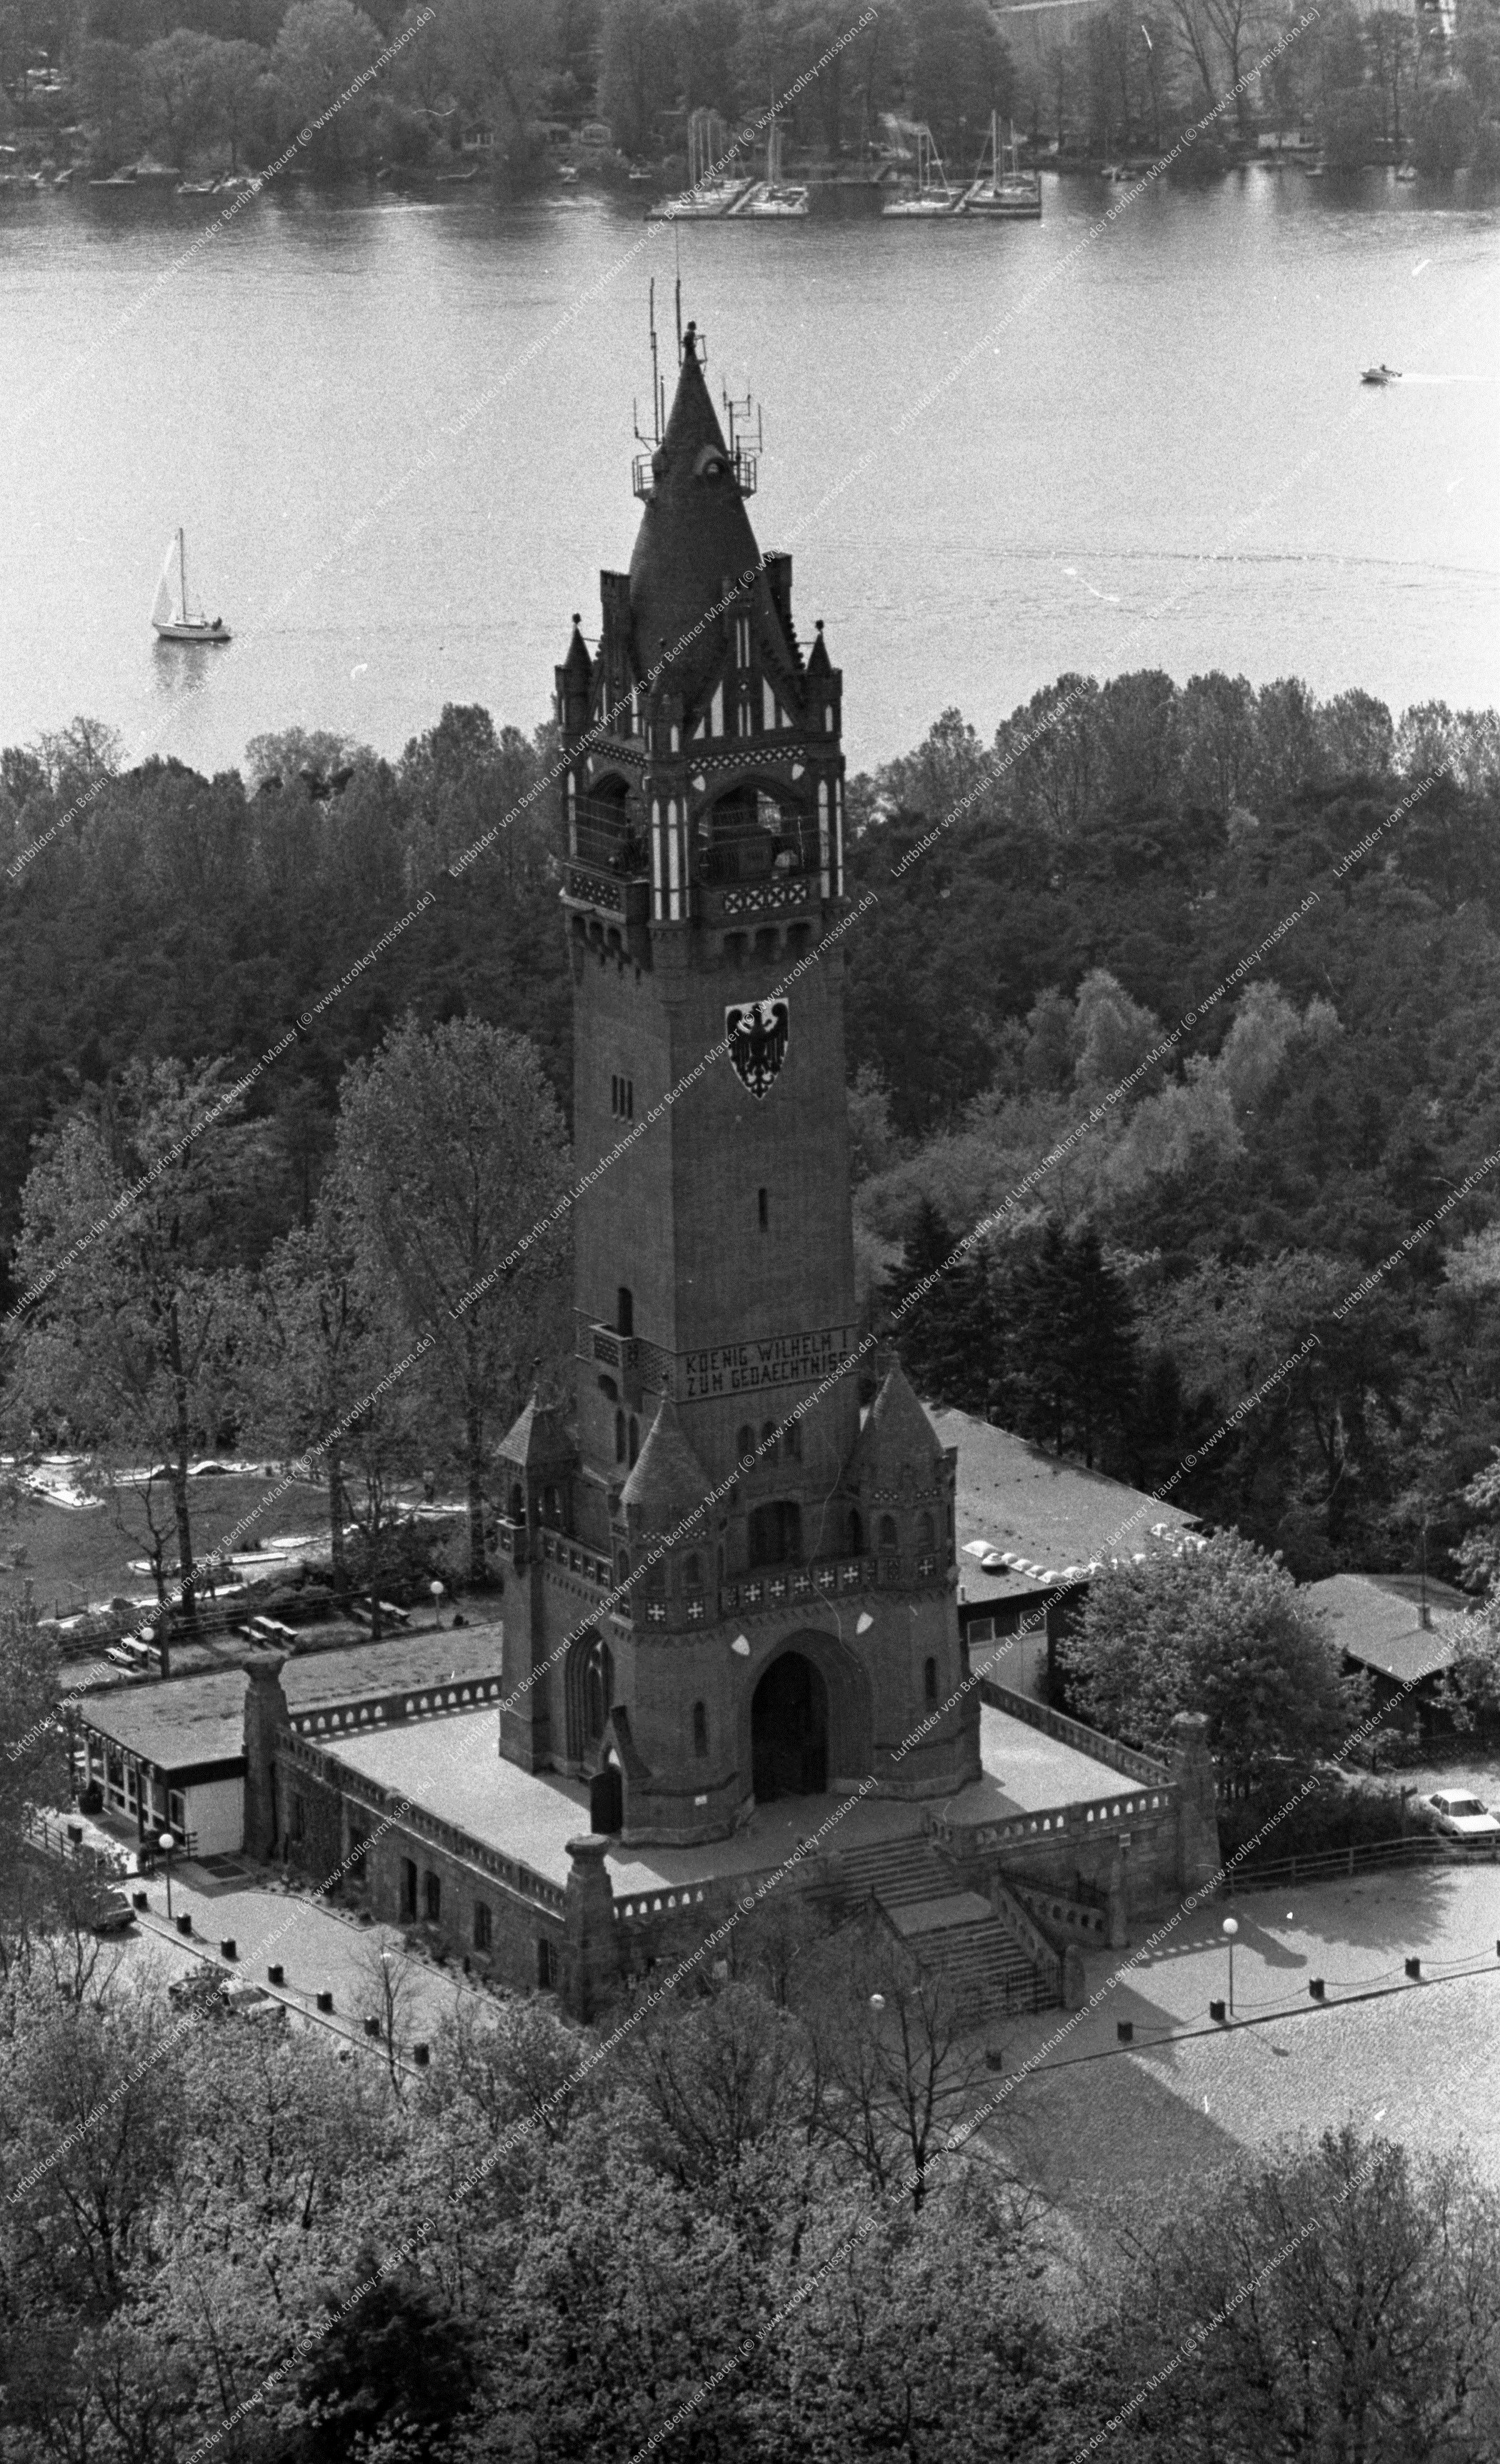 Berlin Luftbild Grunewaldturm vom 12. Mai 1982 (Bild 092)